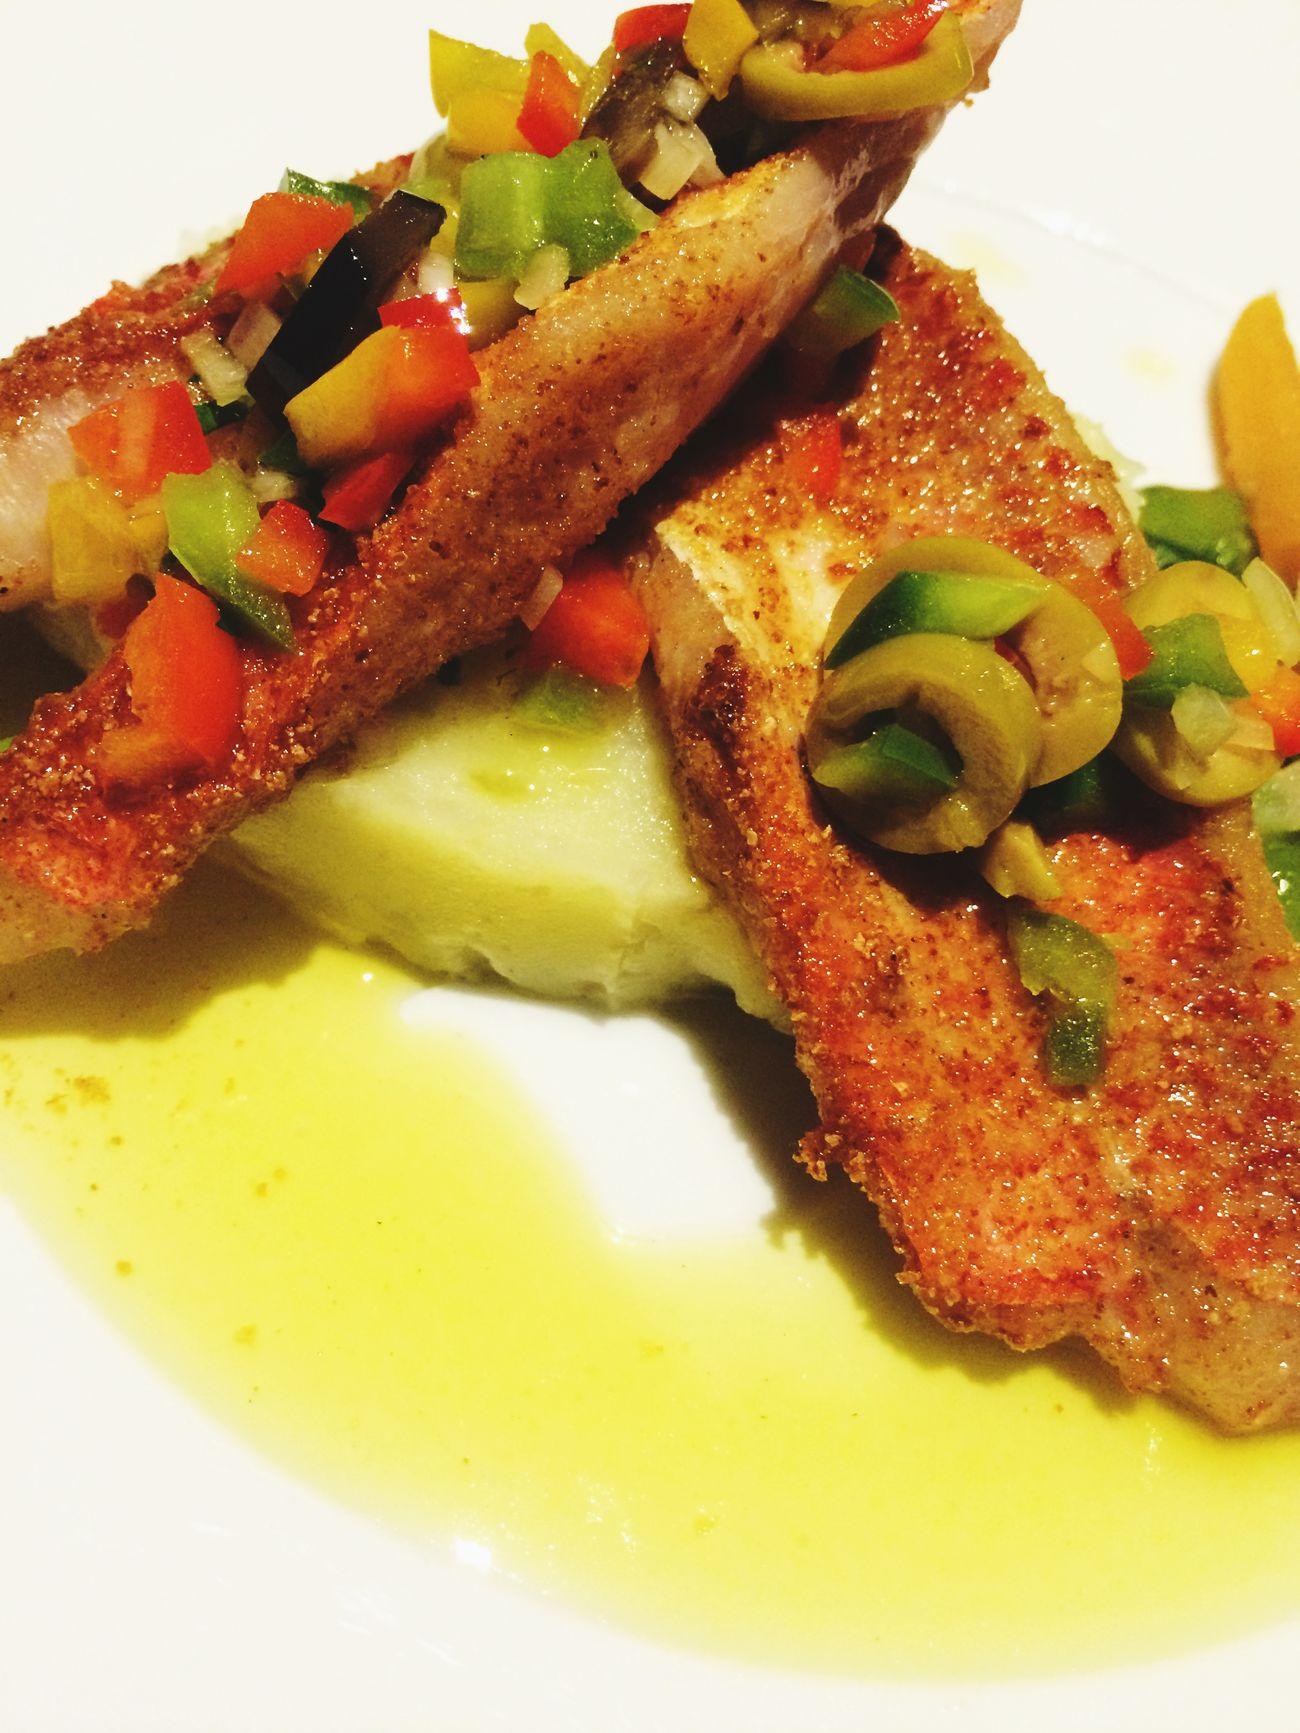 Dinner Fish Cdm15